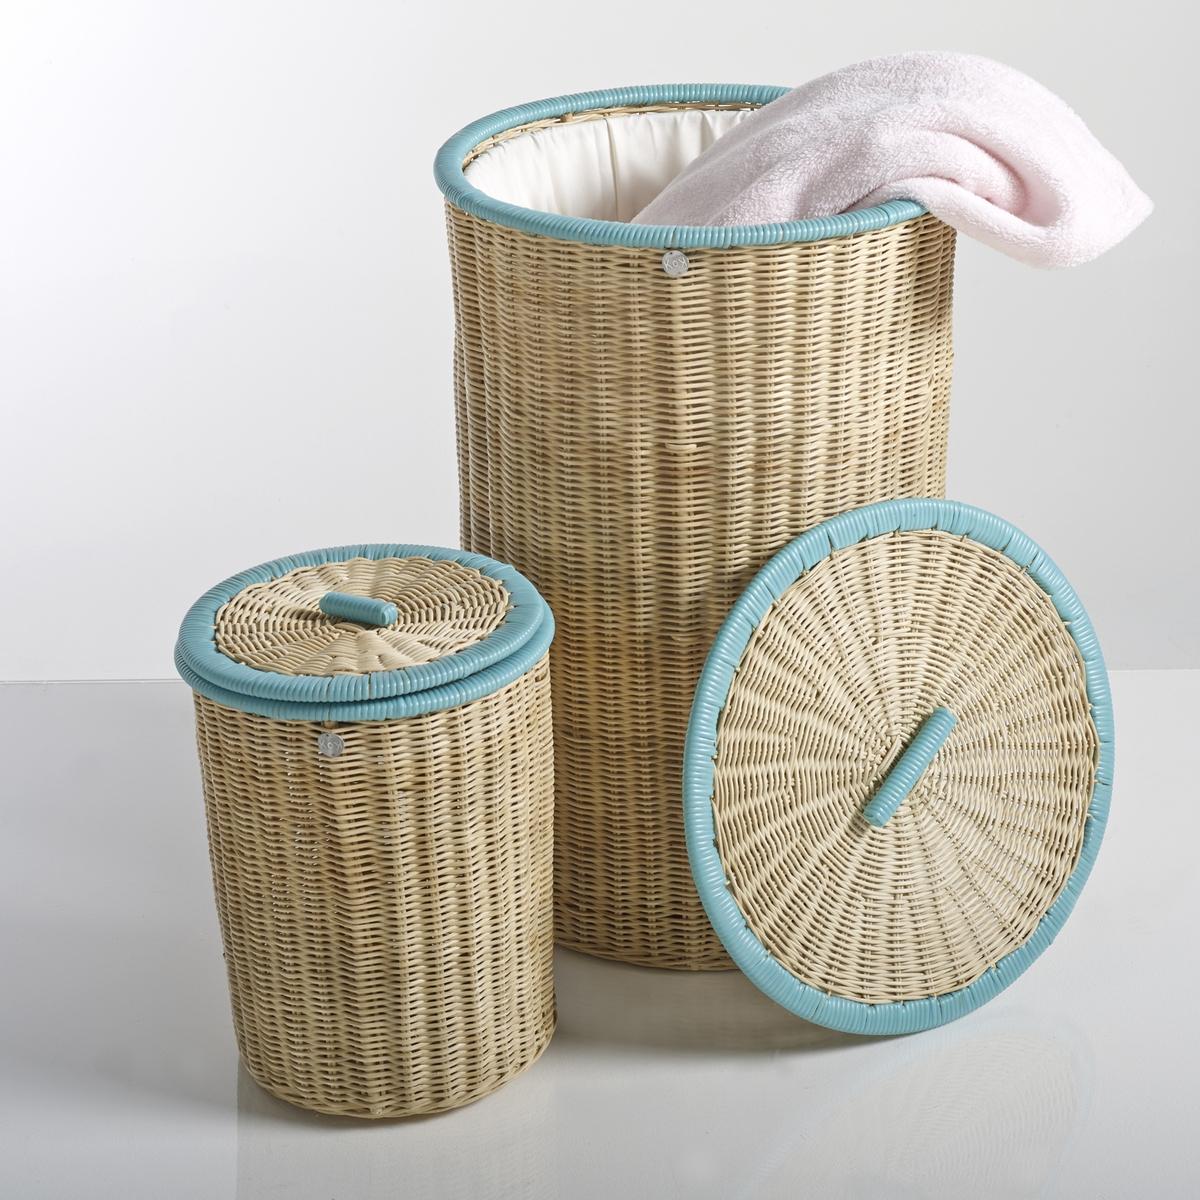 Комплект из 2 корзин с крышкой из ротанга  KOK, Ozier